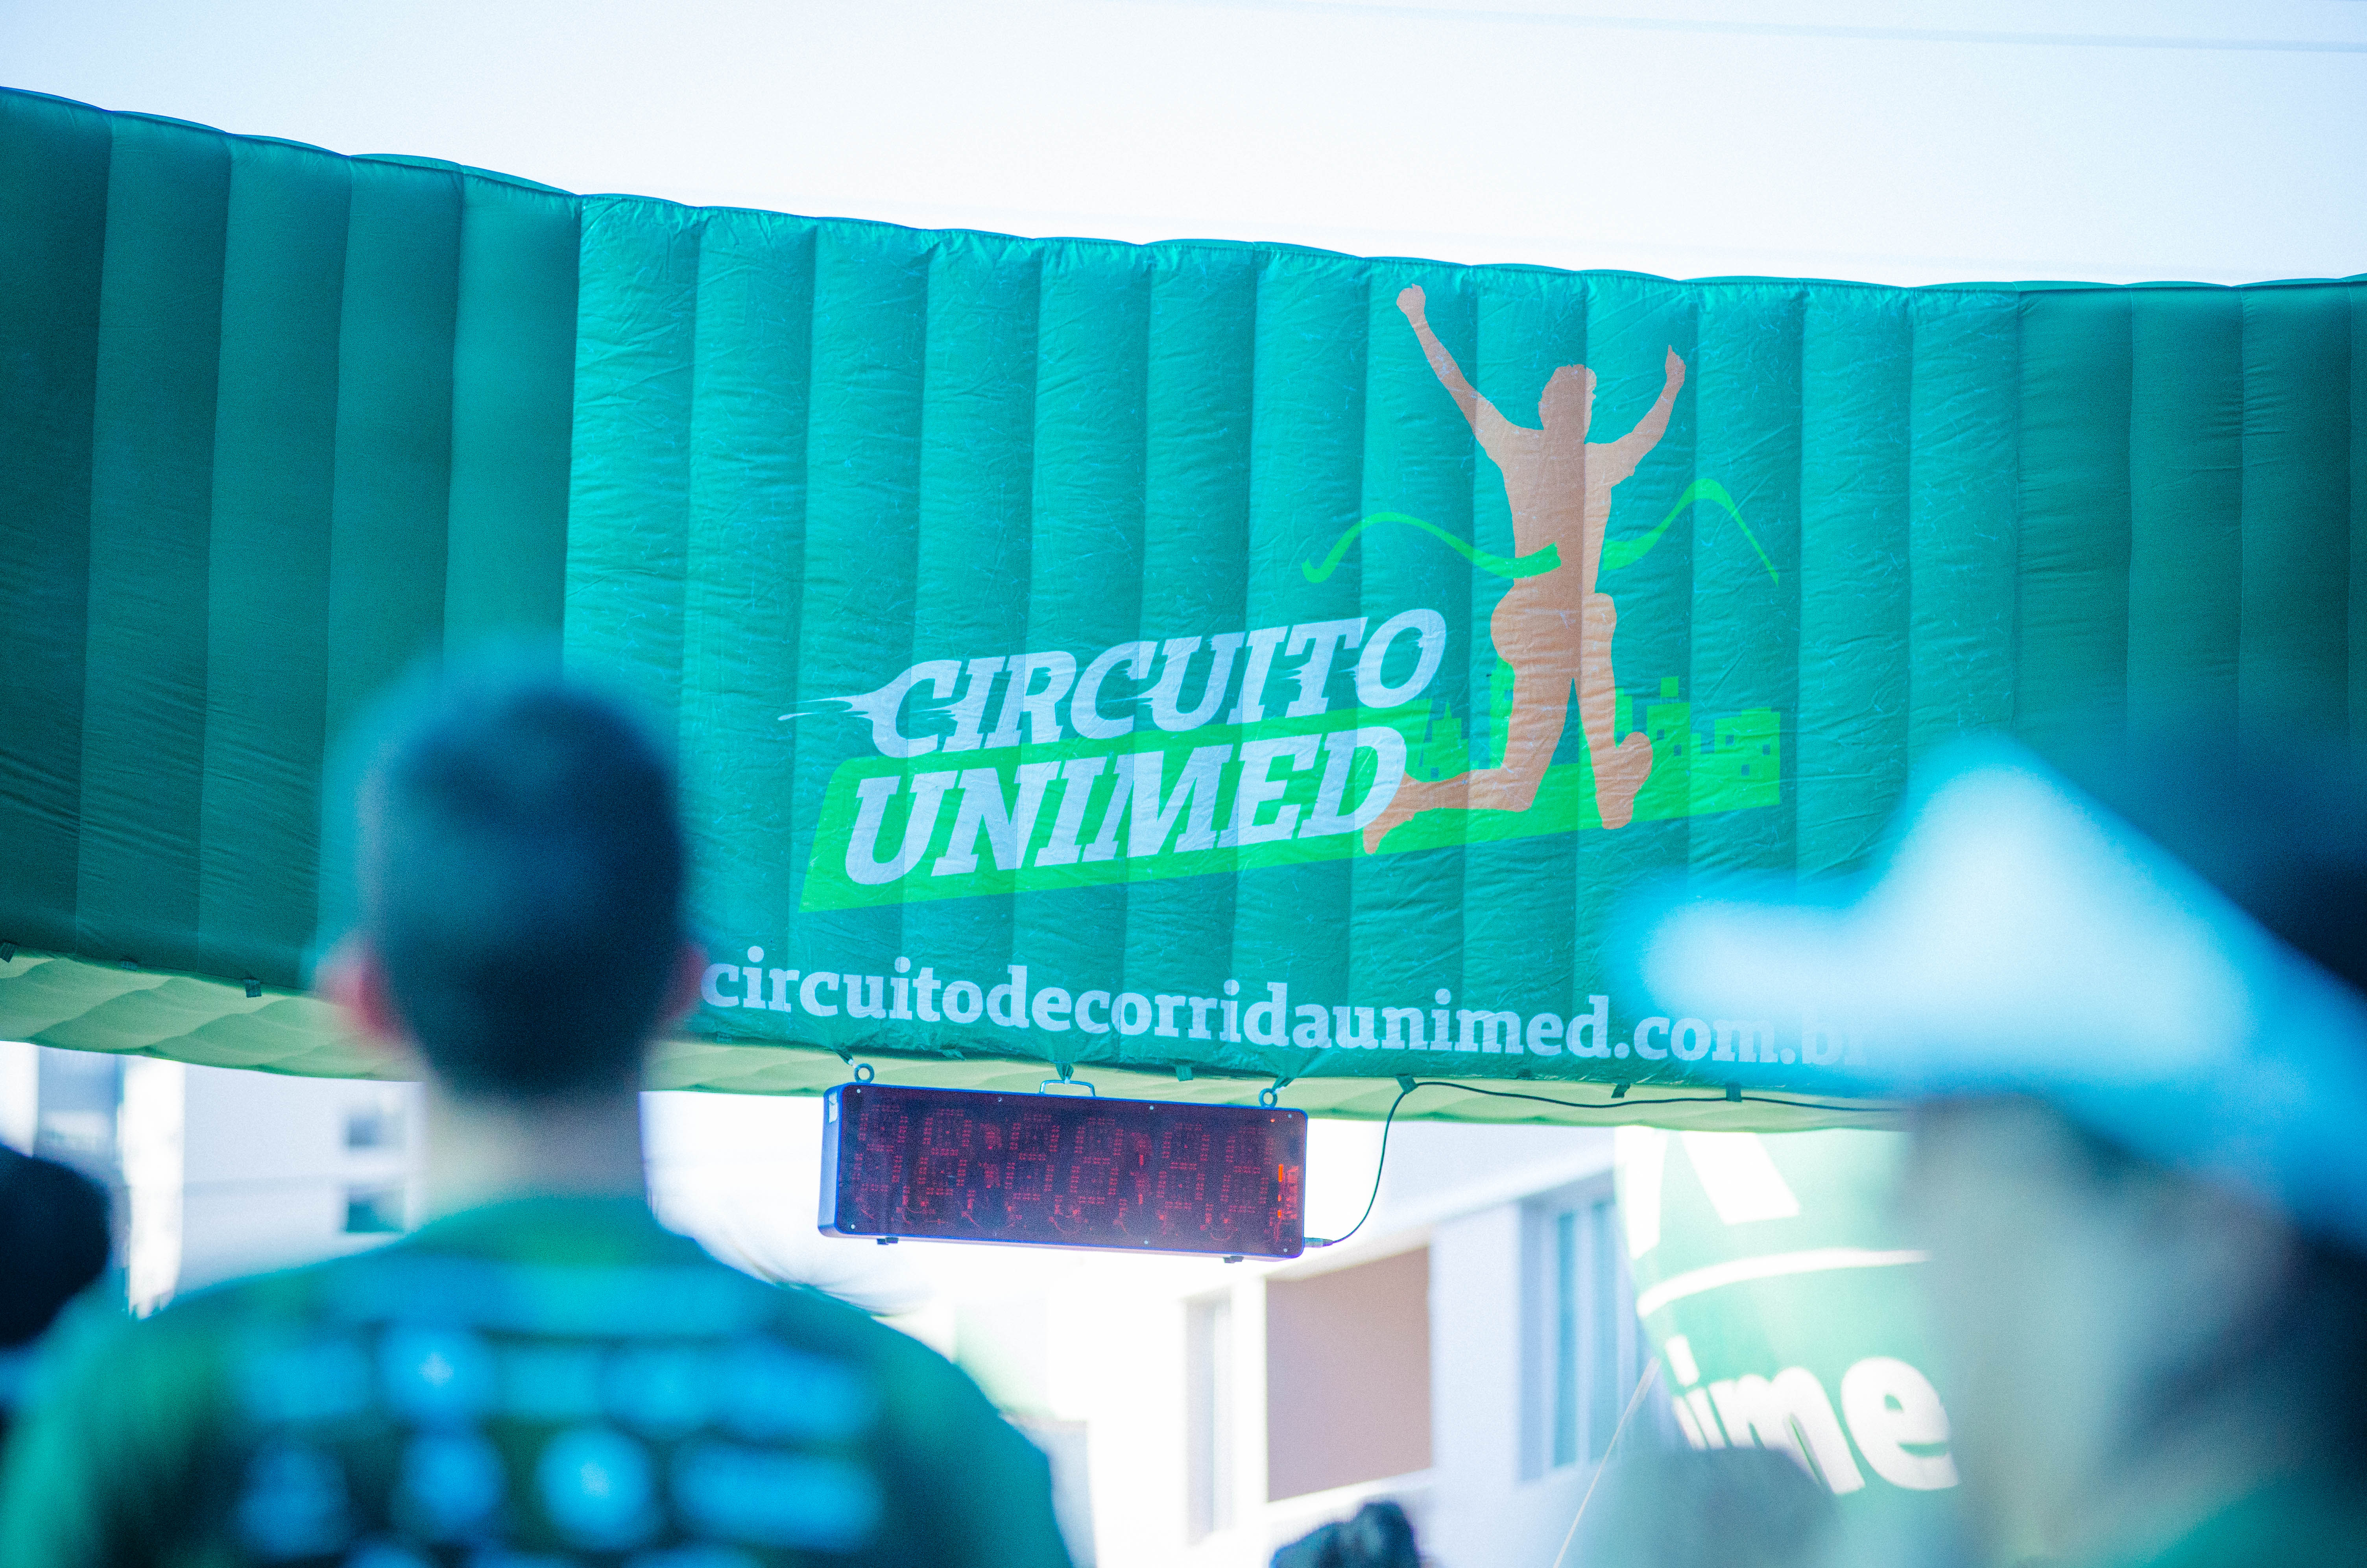 Circuito Unimed : Circuito de corrida da unimed extremo oeste supera expectativas